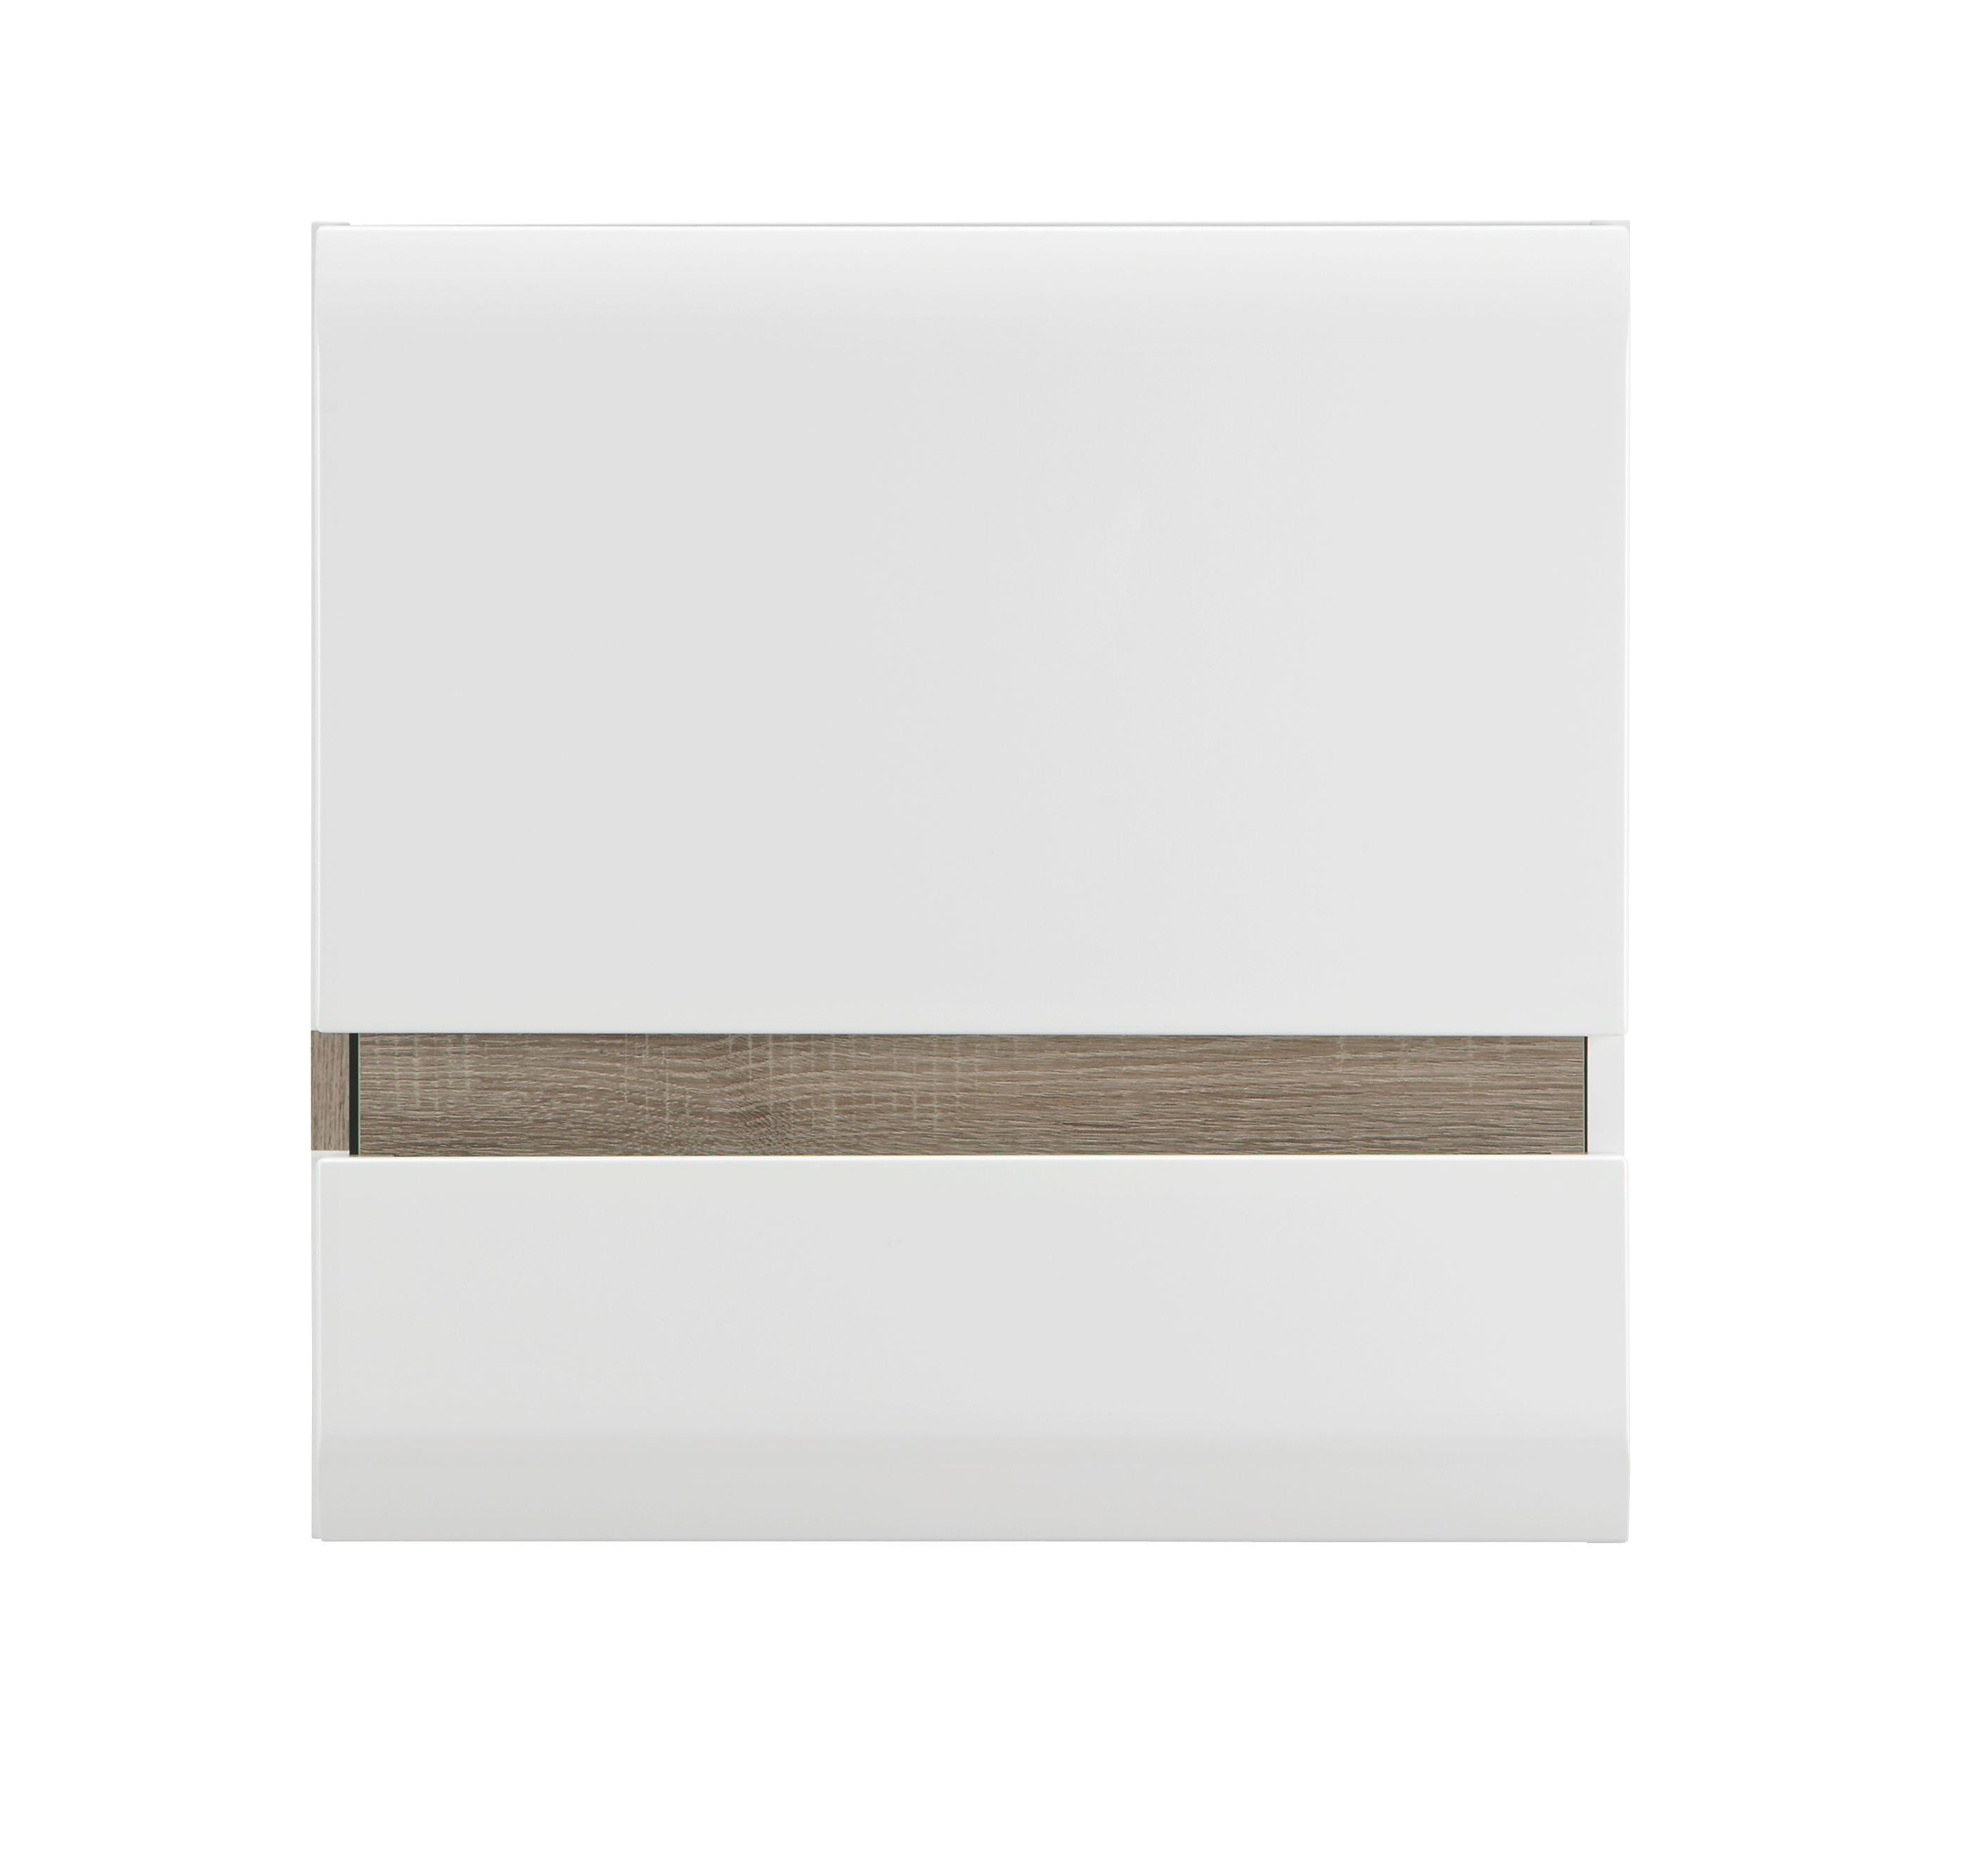 Viseči Element Linate - barva hrasta tartuf/bela, Moderno, leseni material (55/55/28cm) - MÖMAX modern living